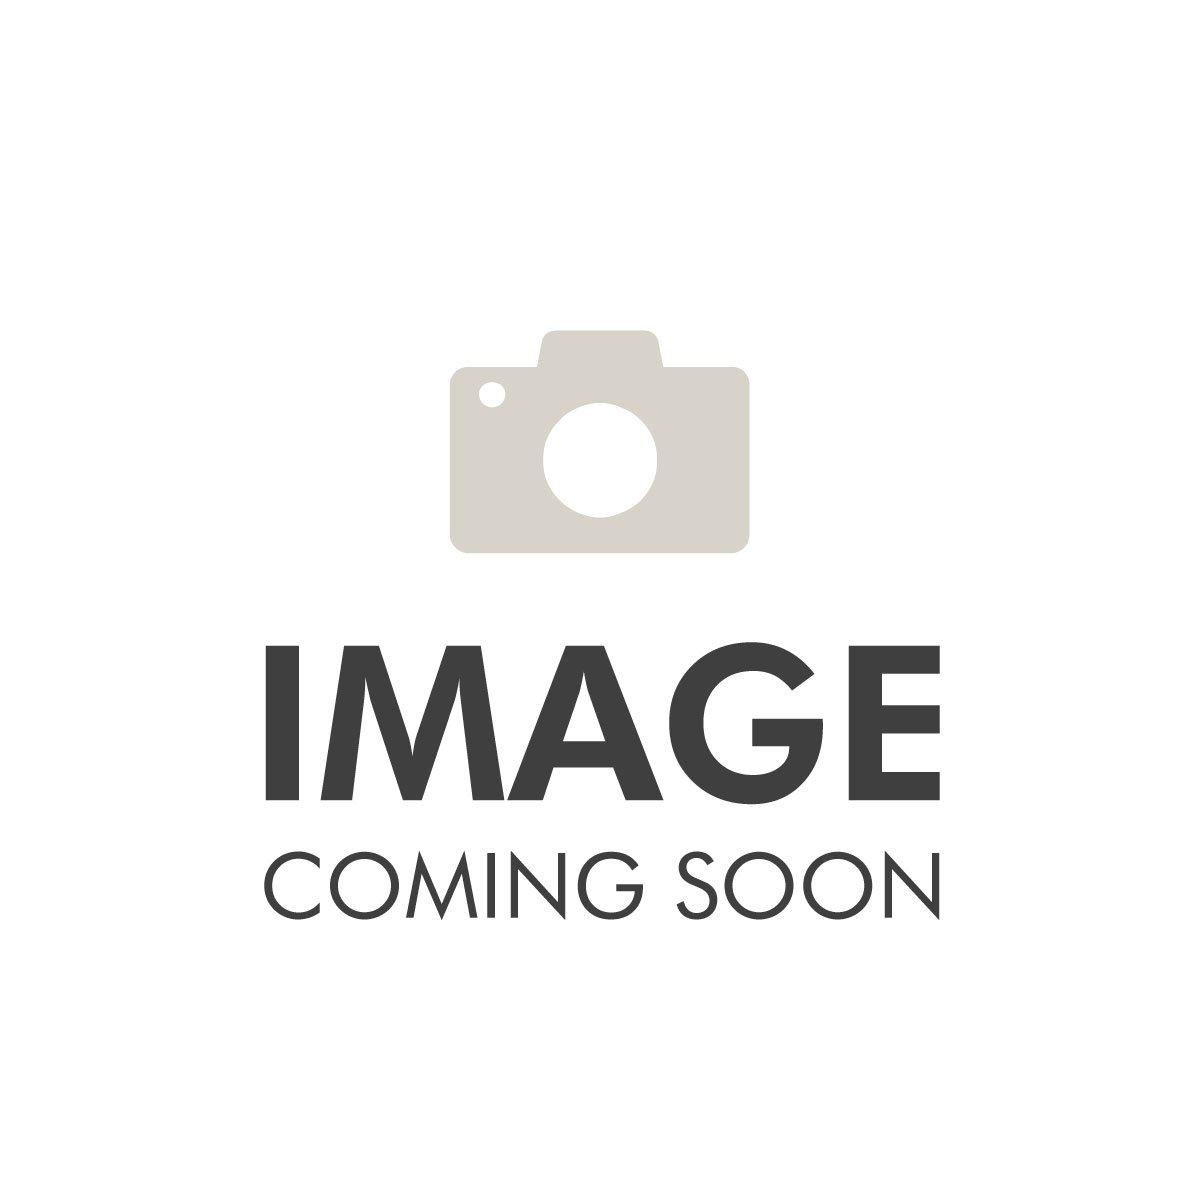 Versace MAN FRAICHE B/S GEL 200ML